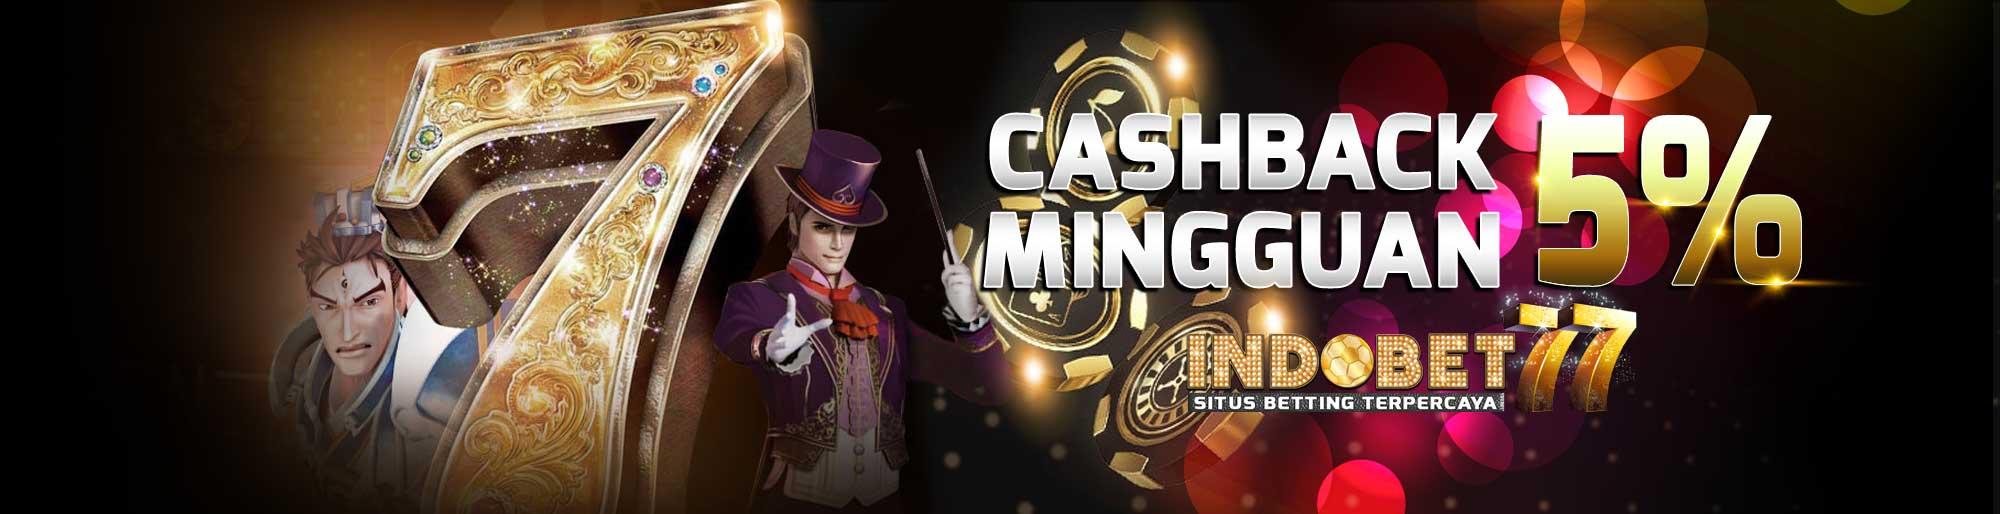 promo cashback bandar agen judi bola, live casino, game slot, sabung ayam online, bola tangkas